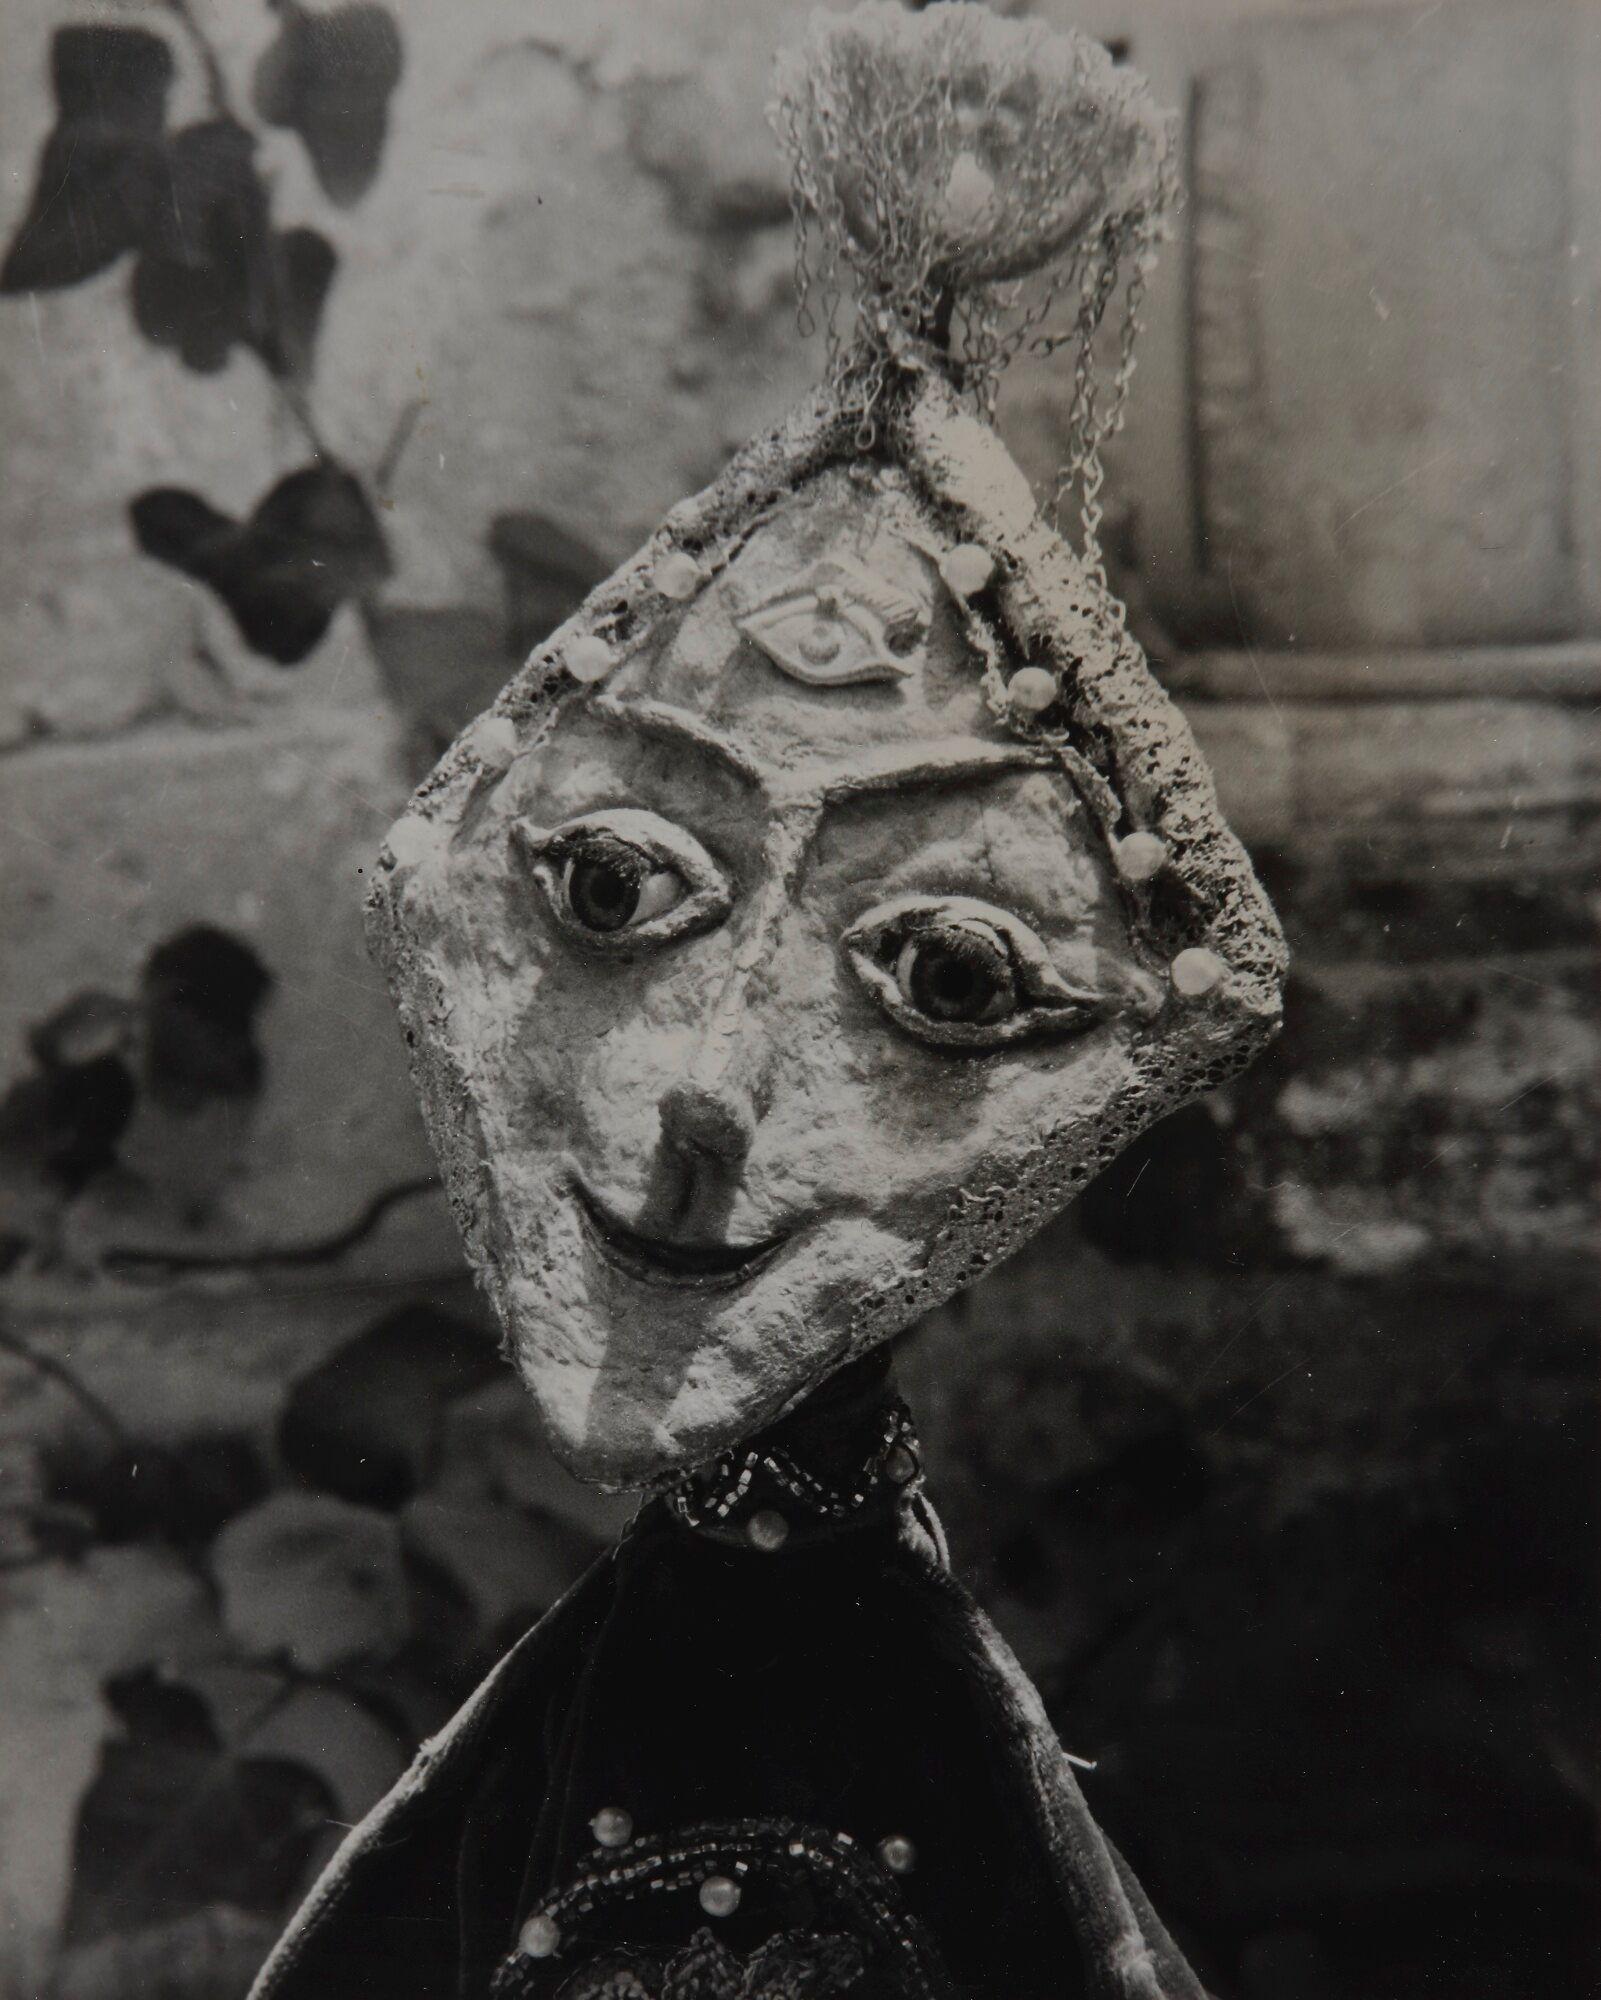 Horna, Kati La Muñeca (the Dol